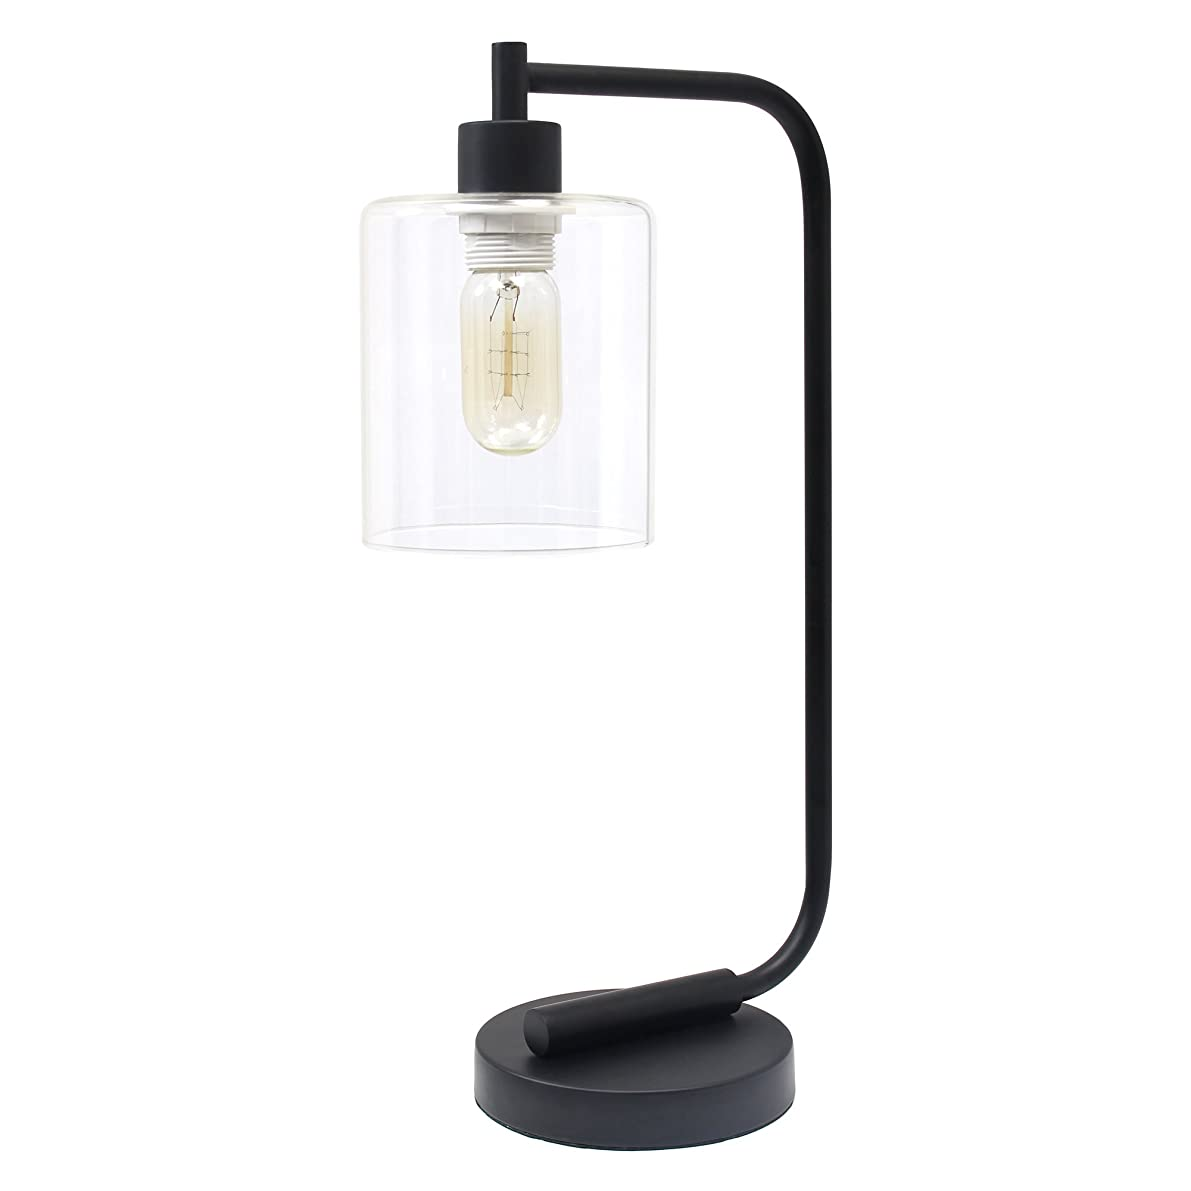 Simple Designs LD1036-BLK Industrial Iron Desk Lantern Lamp, 3.5